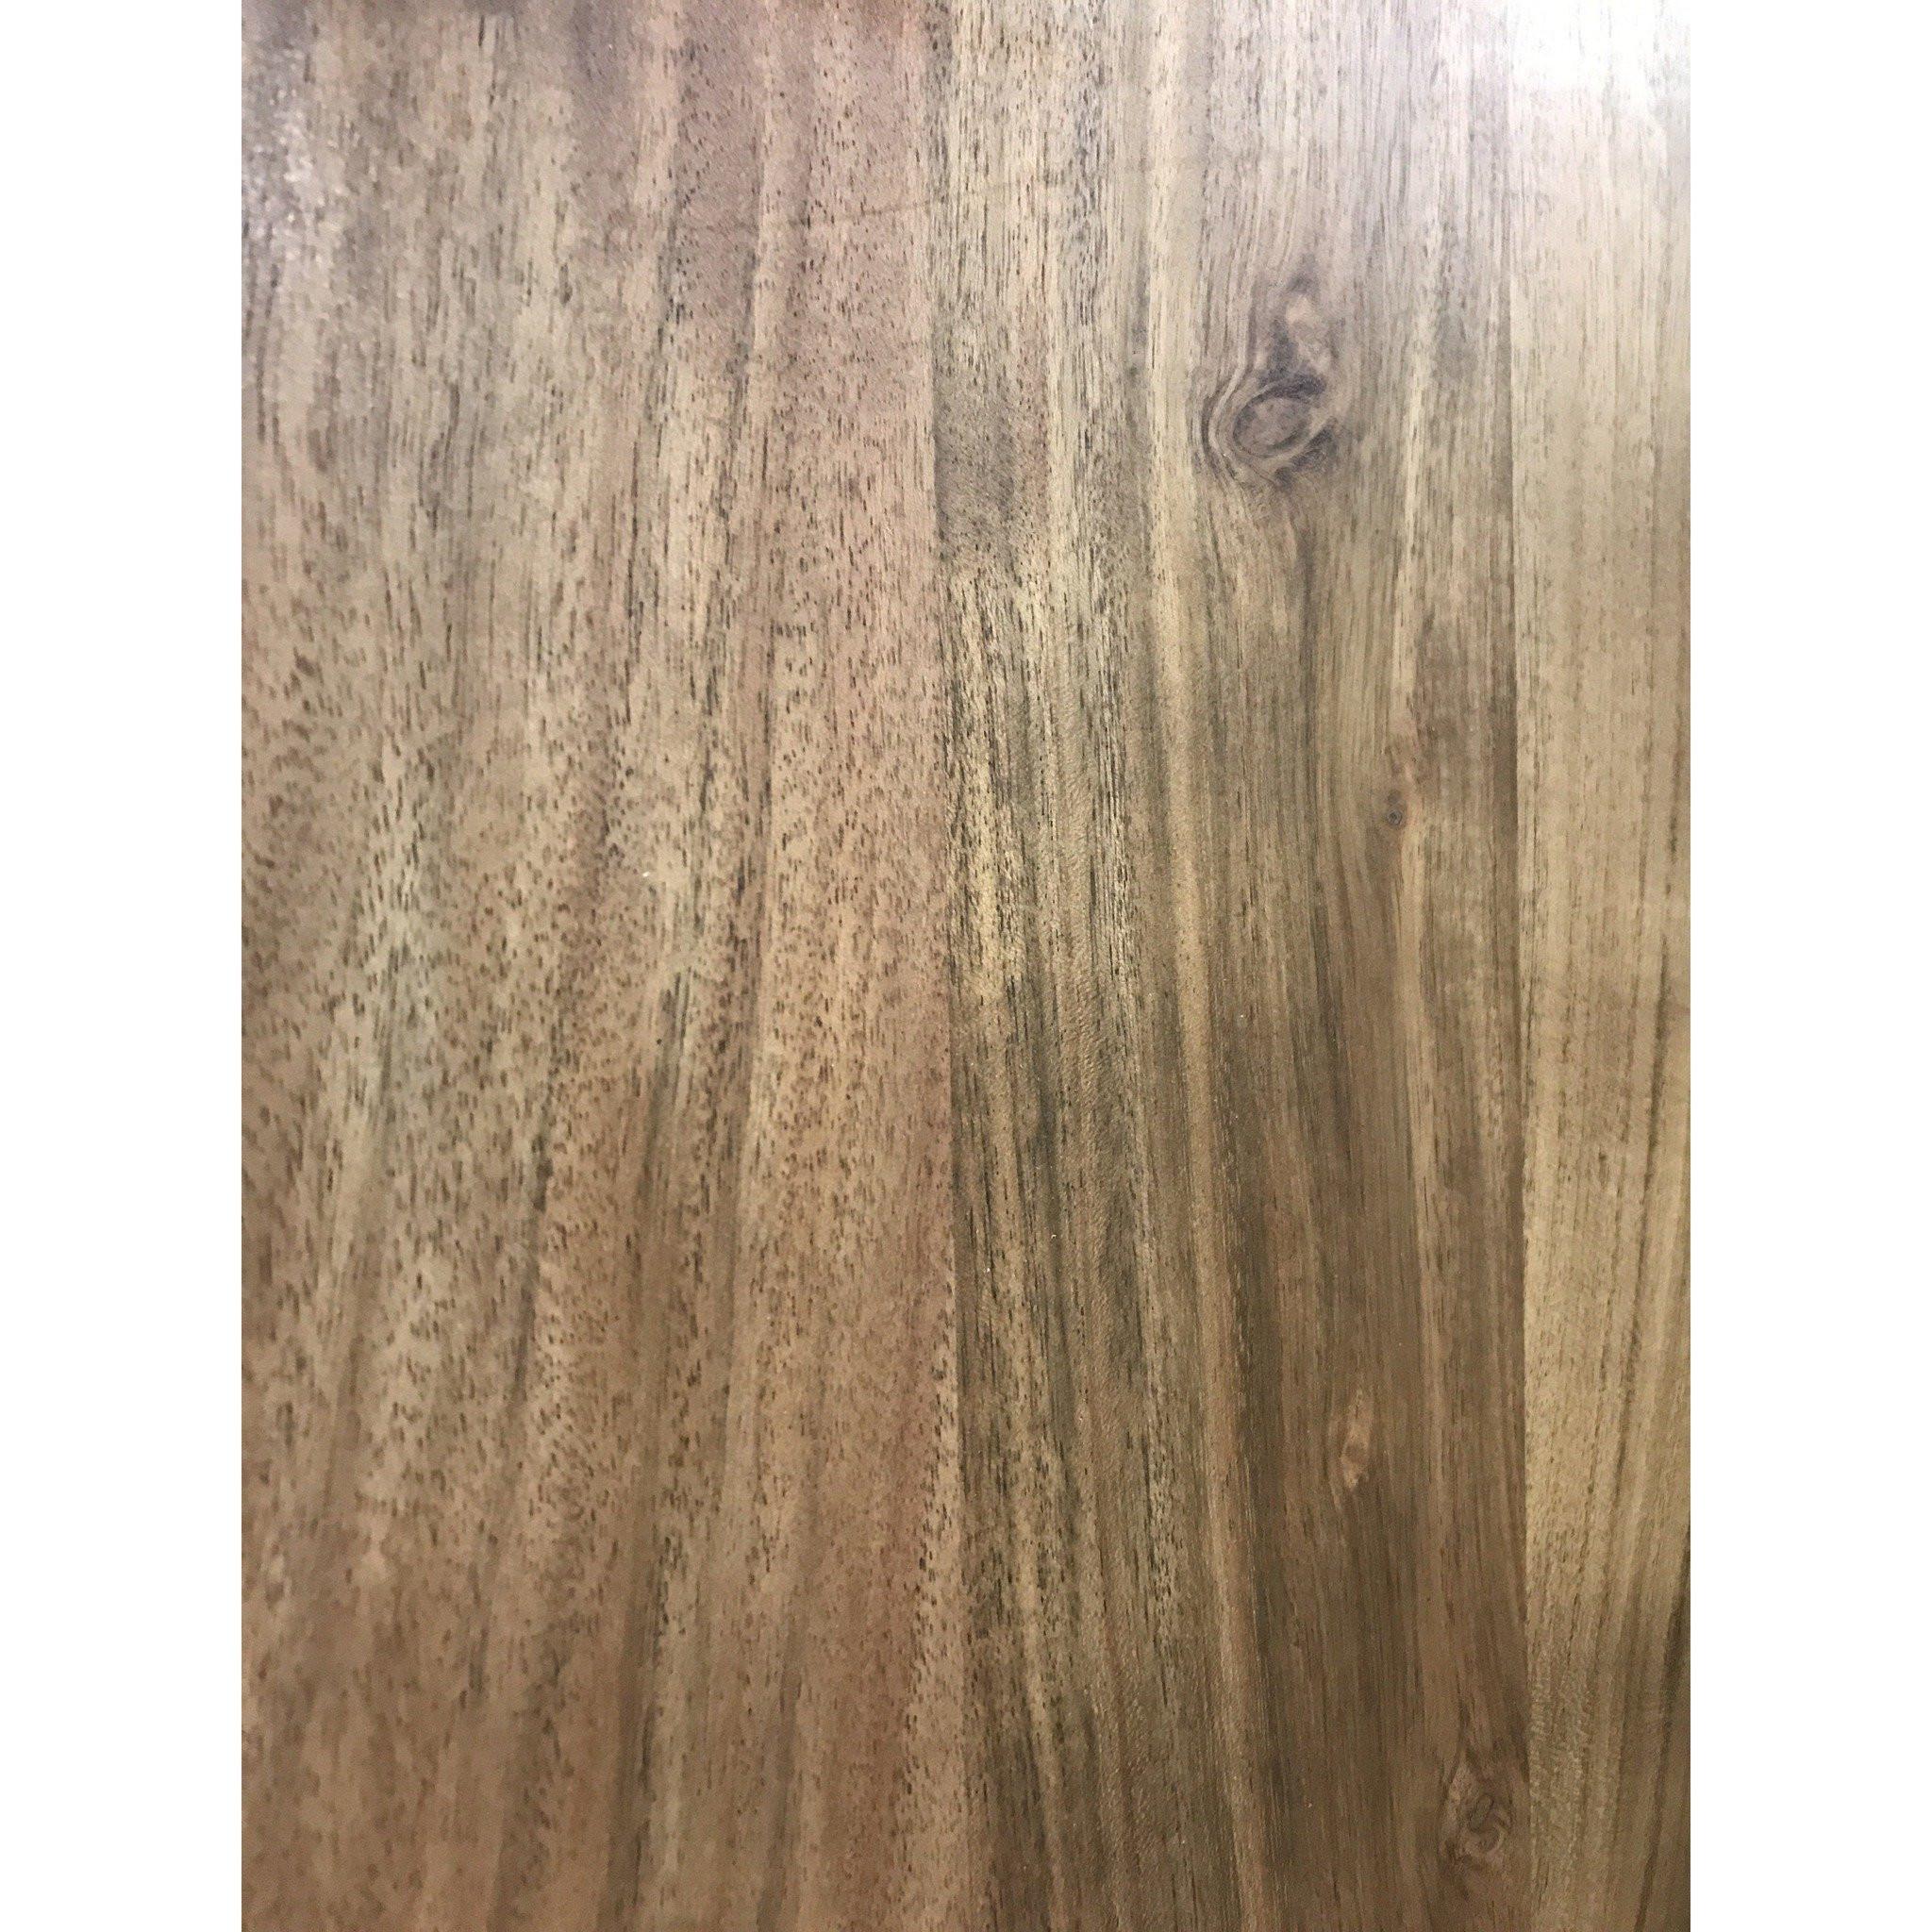 acacia hardwood flooring canada of acacia wood table or kitchen island top entrepat de meubles rustiques inside dessus de table ou dalot en acacia 2 apais